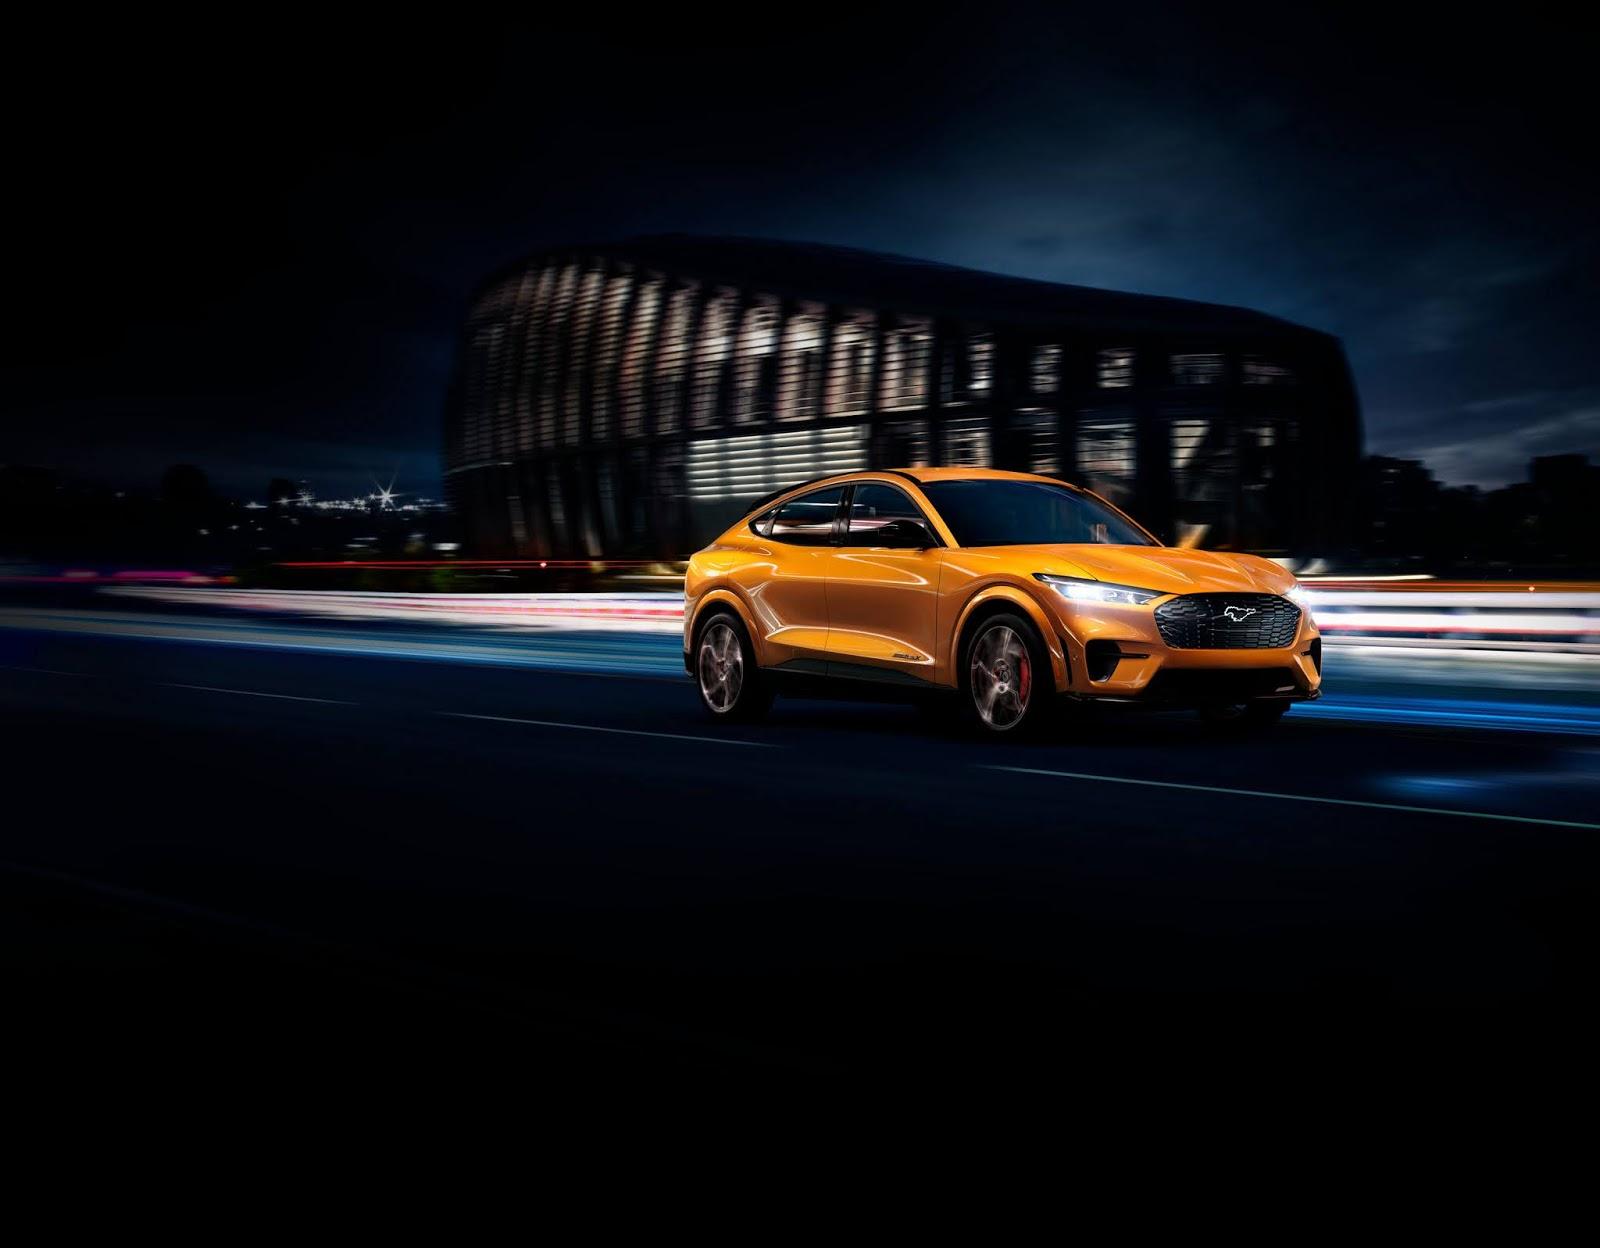 FORD2BMUSTANG2BMACH E2BGT 05 Ευρωπαϊκό ντεμπούτο για την ηλεκτρική Mustang Mach-E GT των 465 ίππων Electric cars, electric vehicles, EV, Ford, Ford Mustang, Ford Mustang Mach-E, ειδήσεις